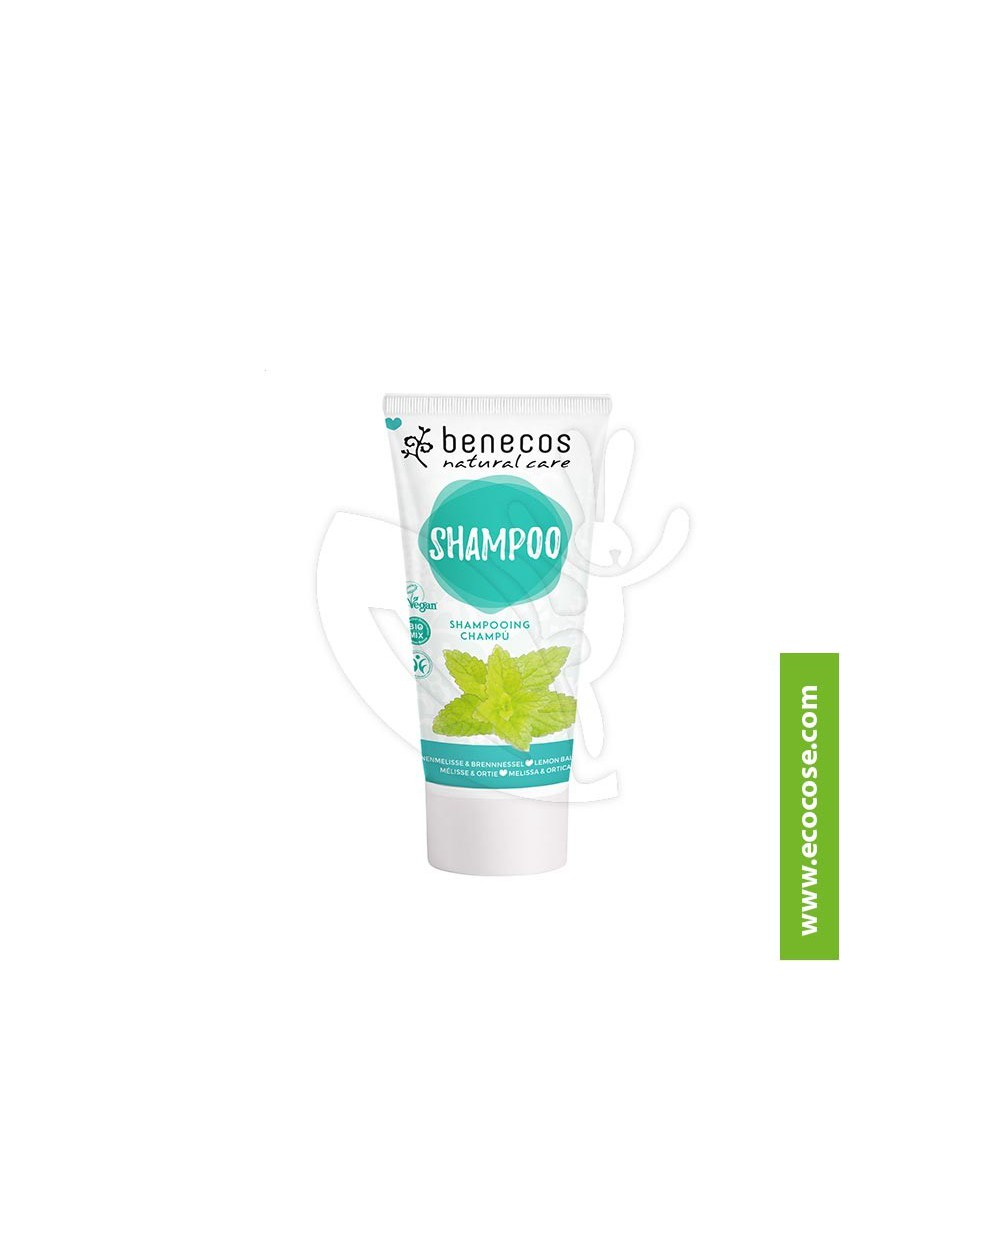 Benecos Natural Care - Shampoo - Melissa e Ortica